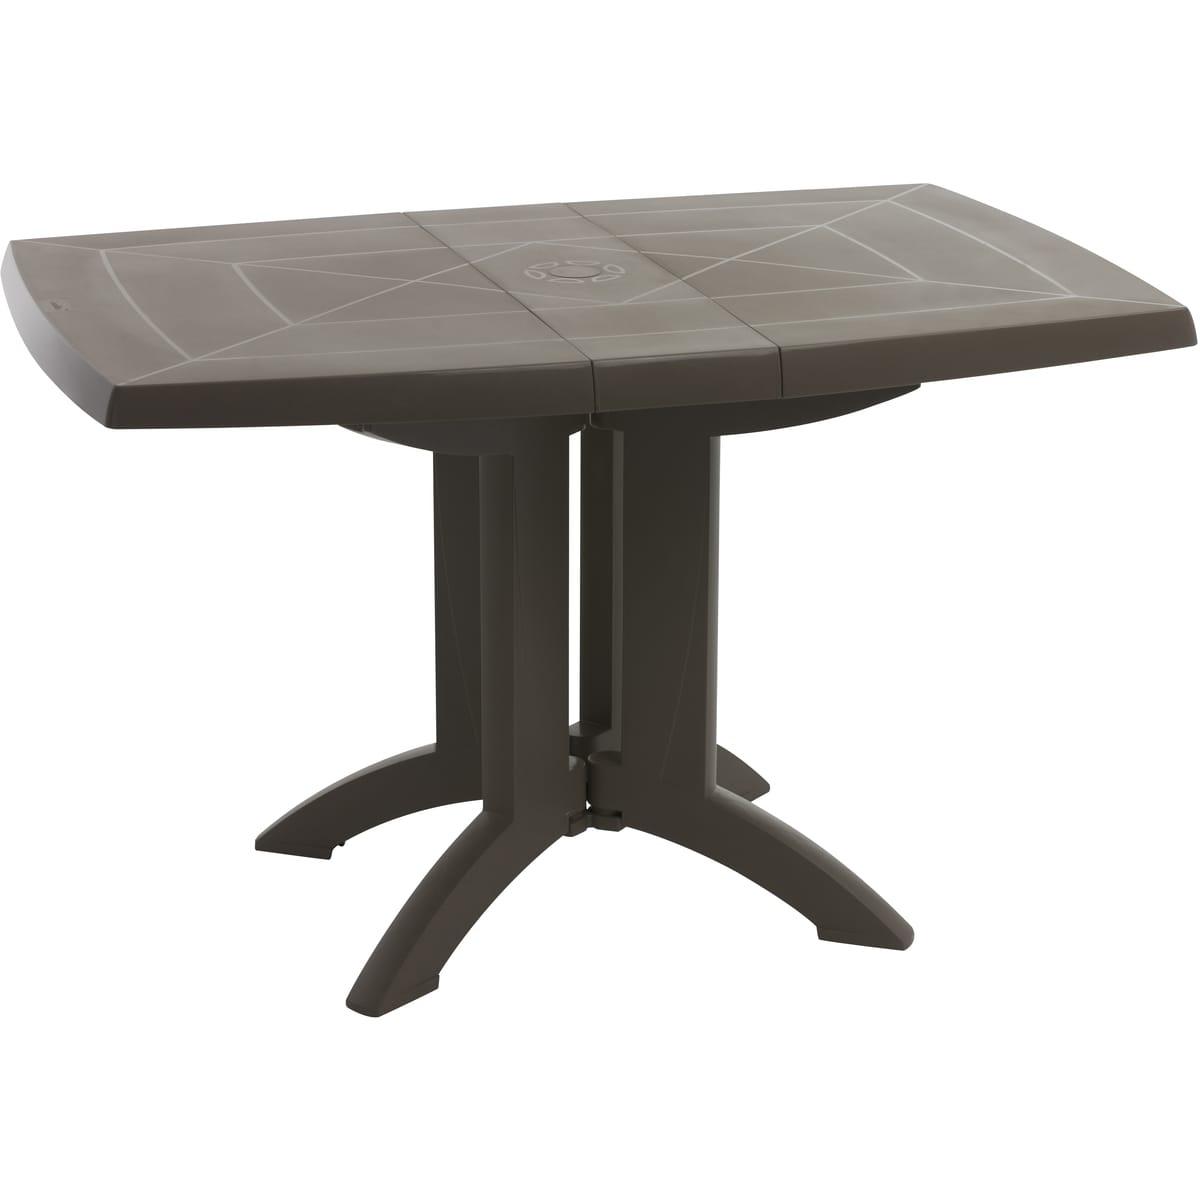 Grosfillex Table De Jardin Pliante 118X77Cm Résine Taupe Vega dedans Auchan Table De Jardin